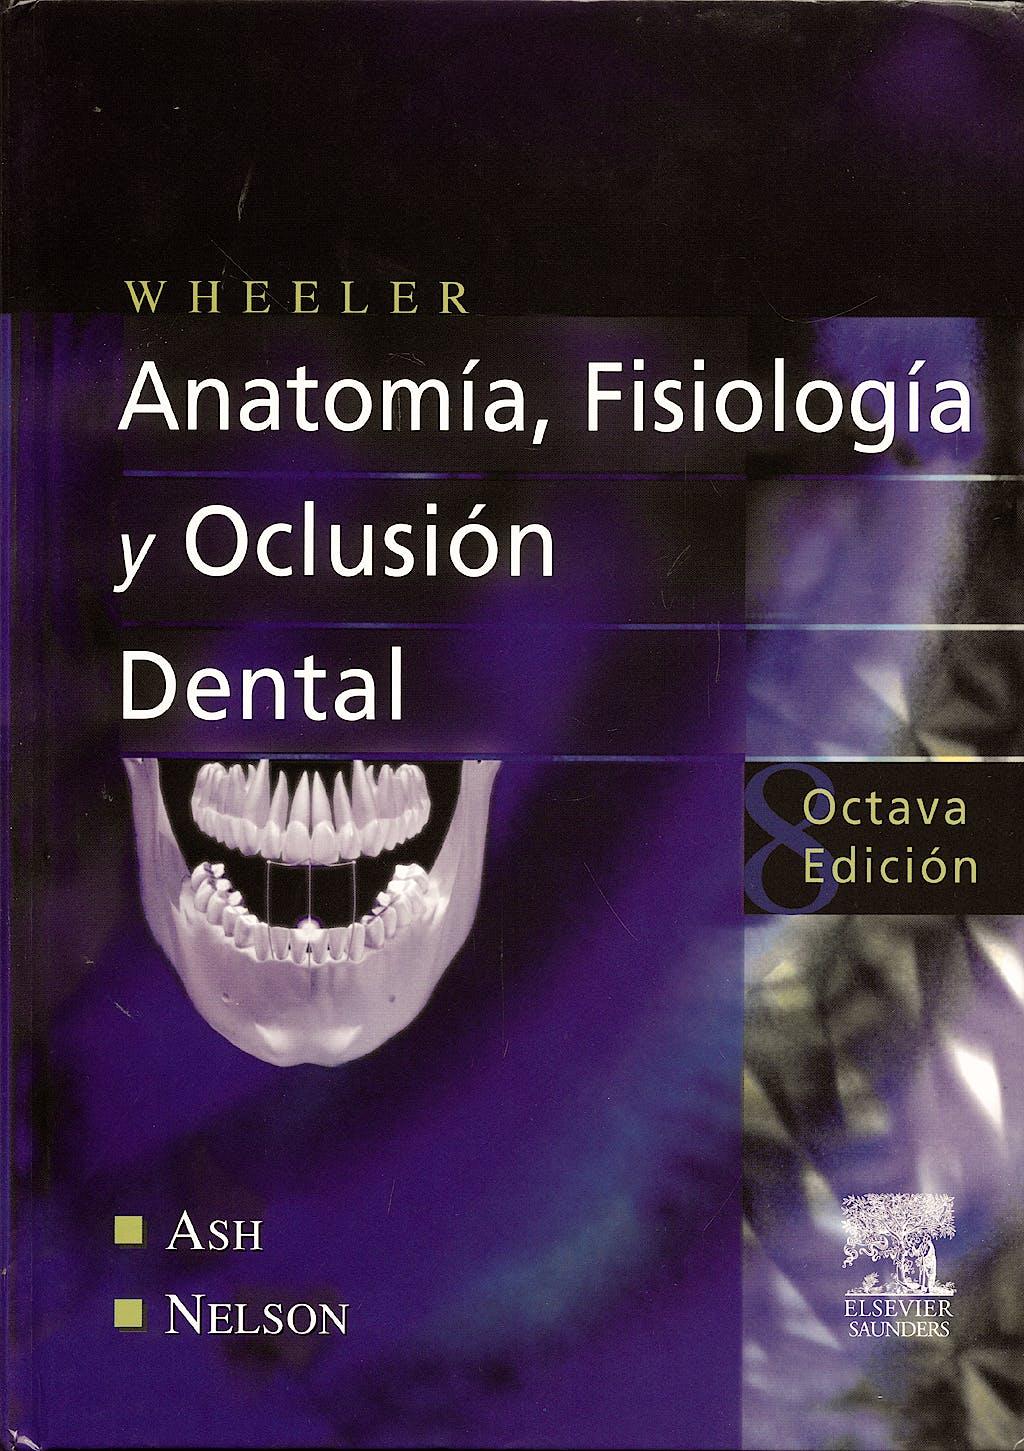 Producto: Wheeler Anatomia, Fisiologia y Oclusion Dental